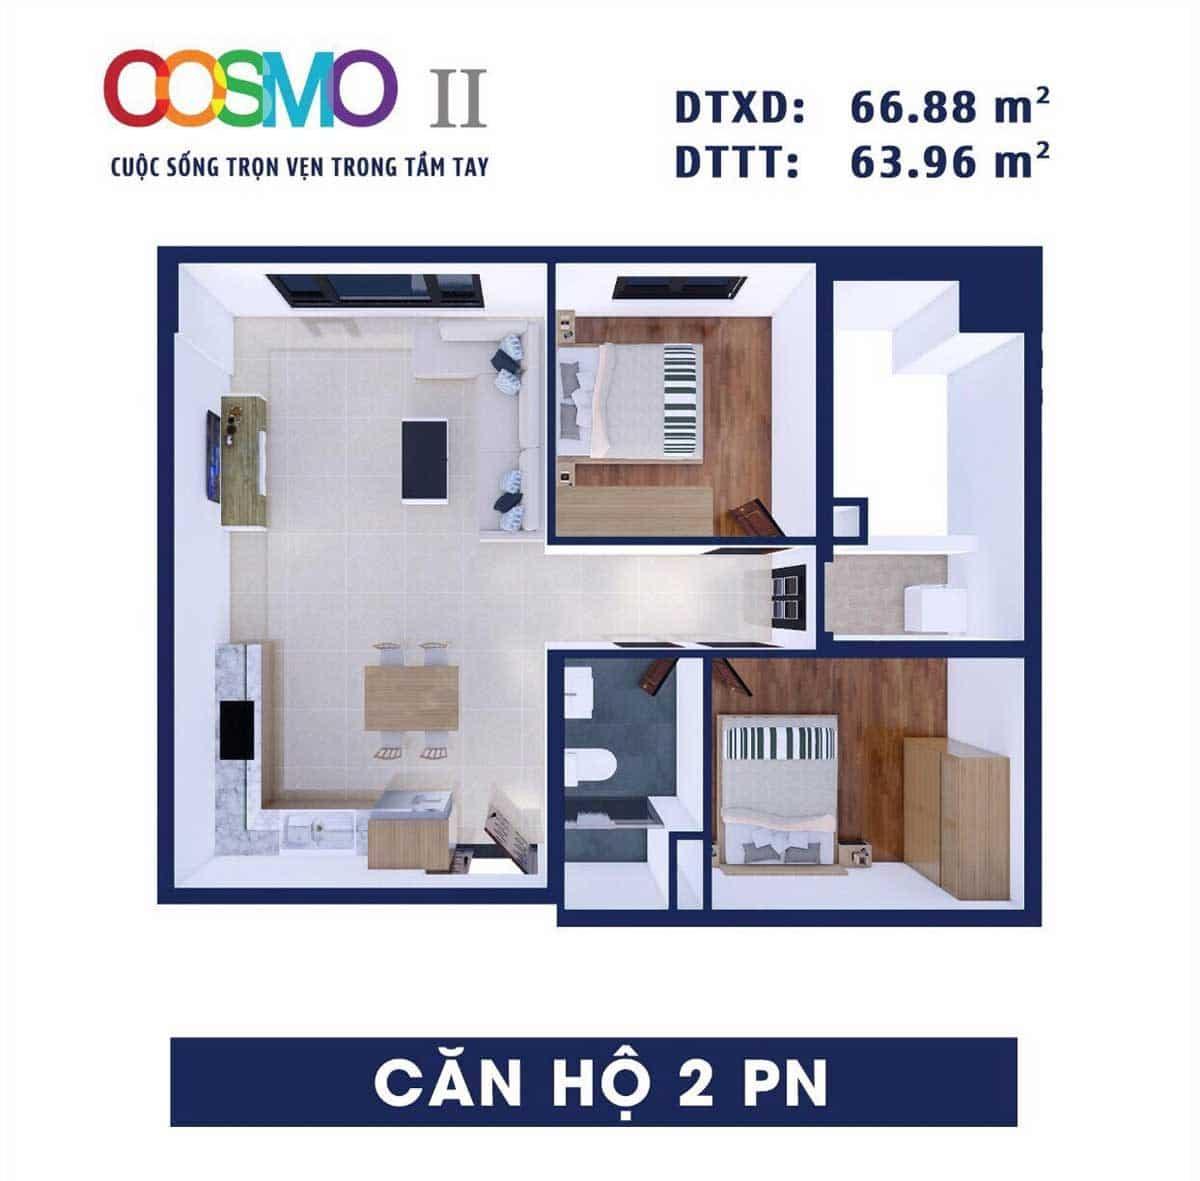 thiet-ke-can-ho-2-PN-dien-tich-66,88m2-cosmo-2